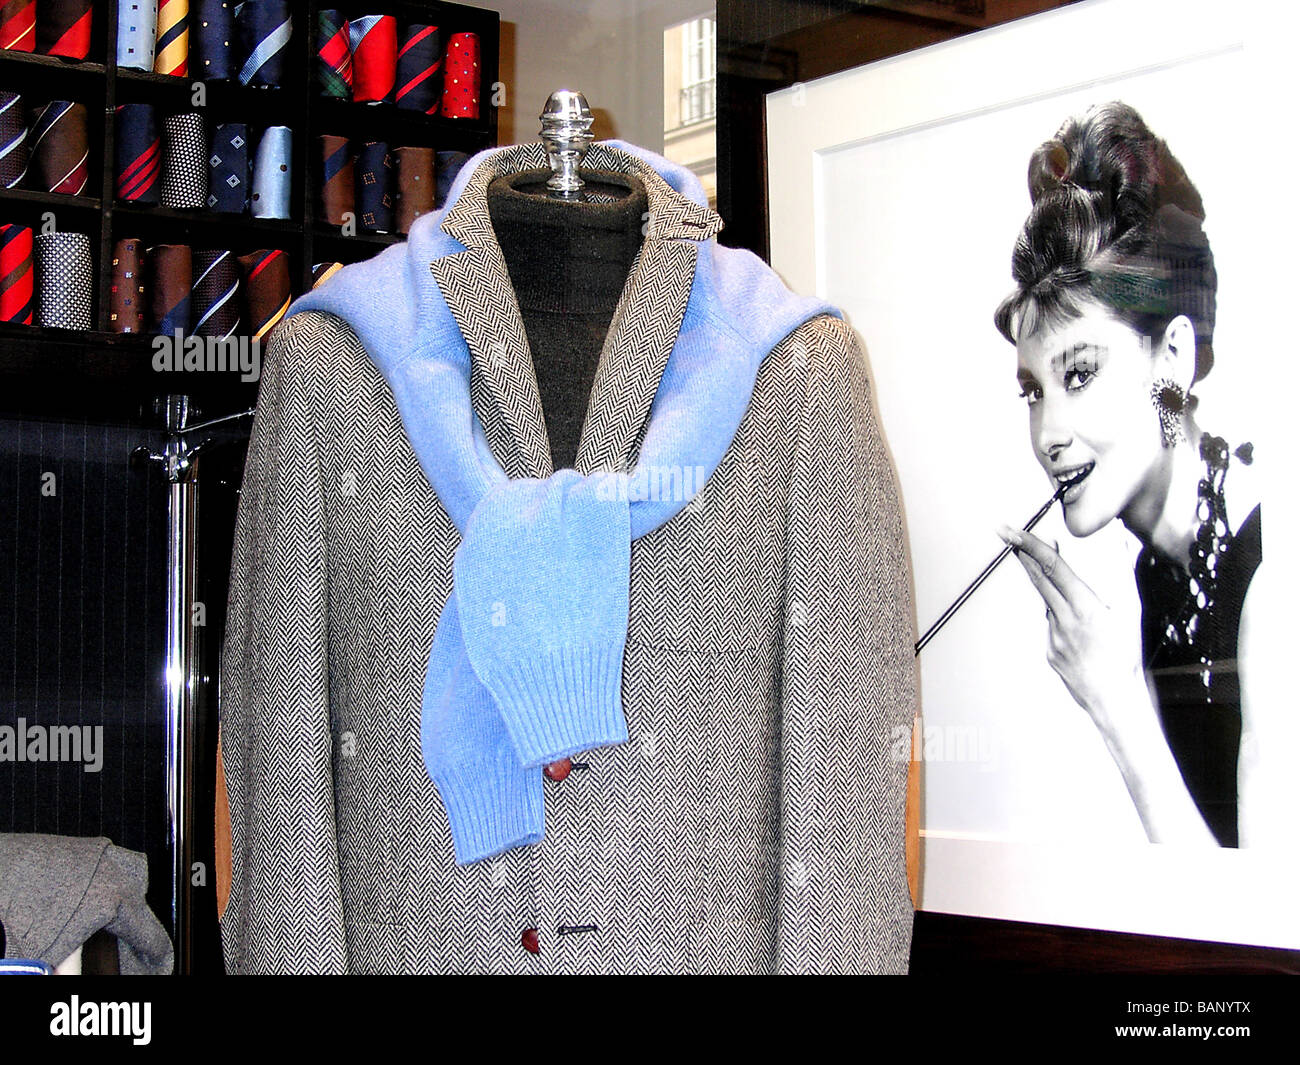 Breakfast at Tiffany's, Audrey Hepburn and showcase - Stock Image